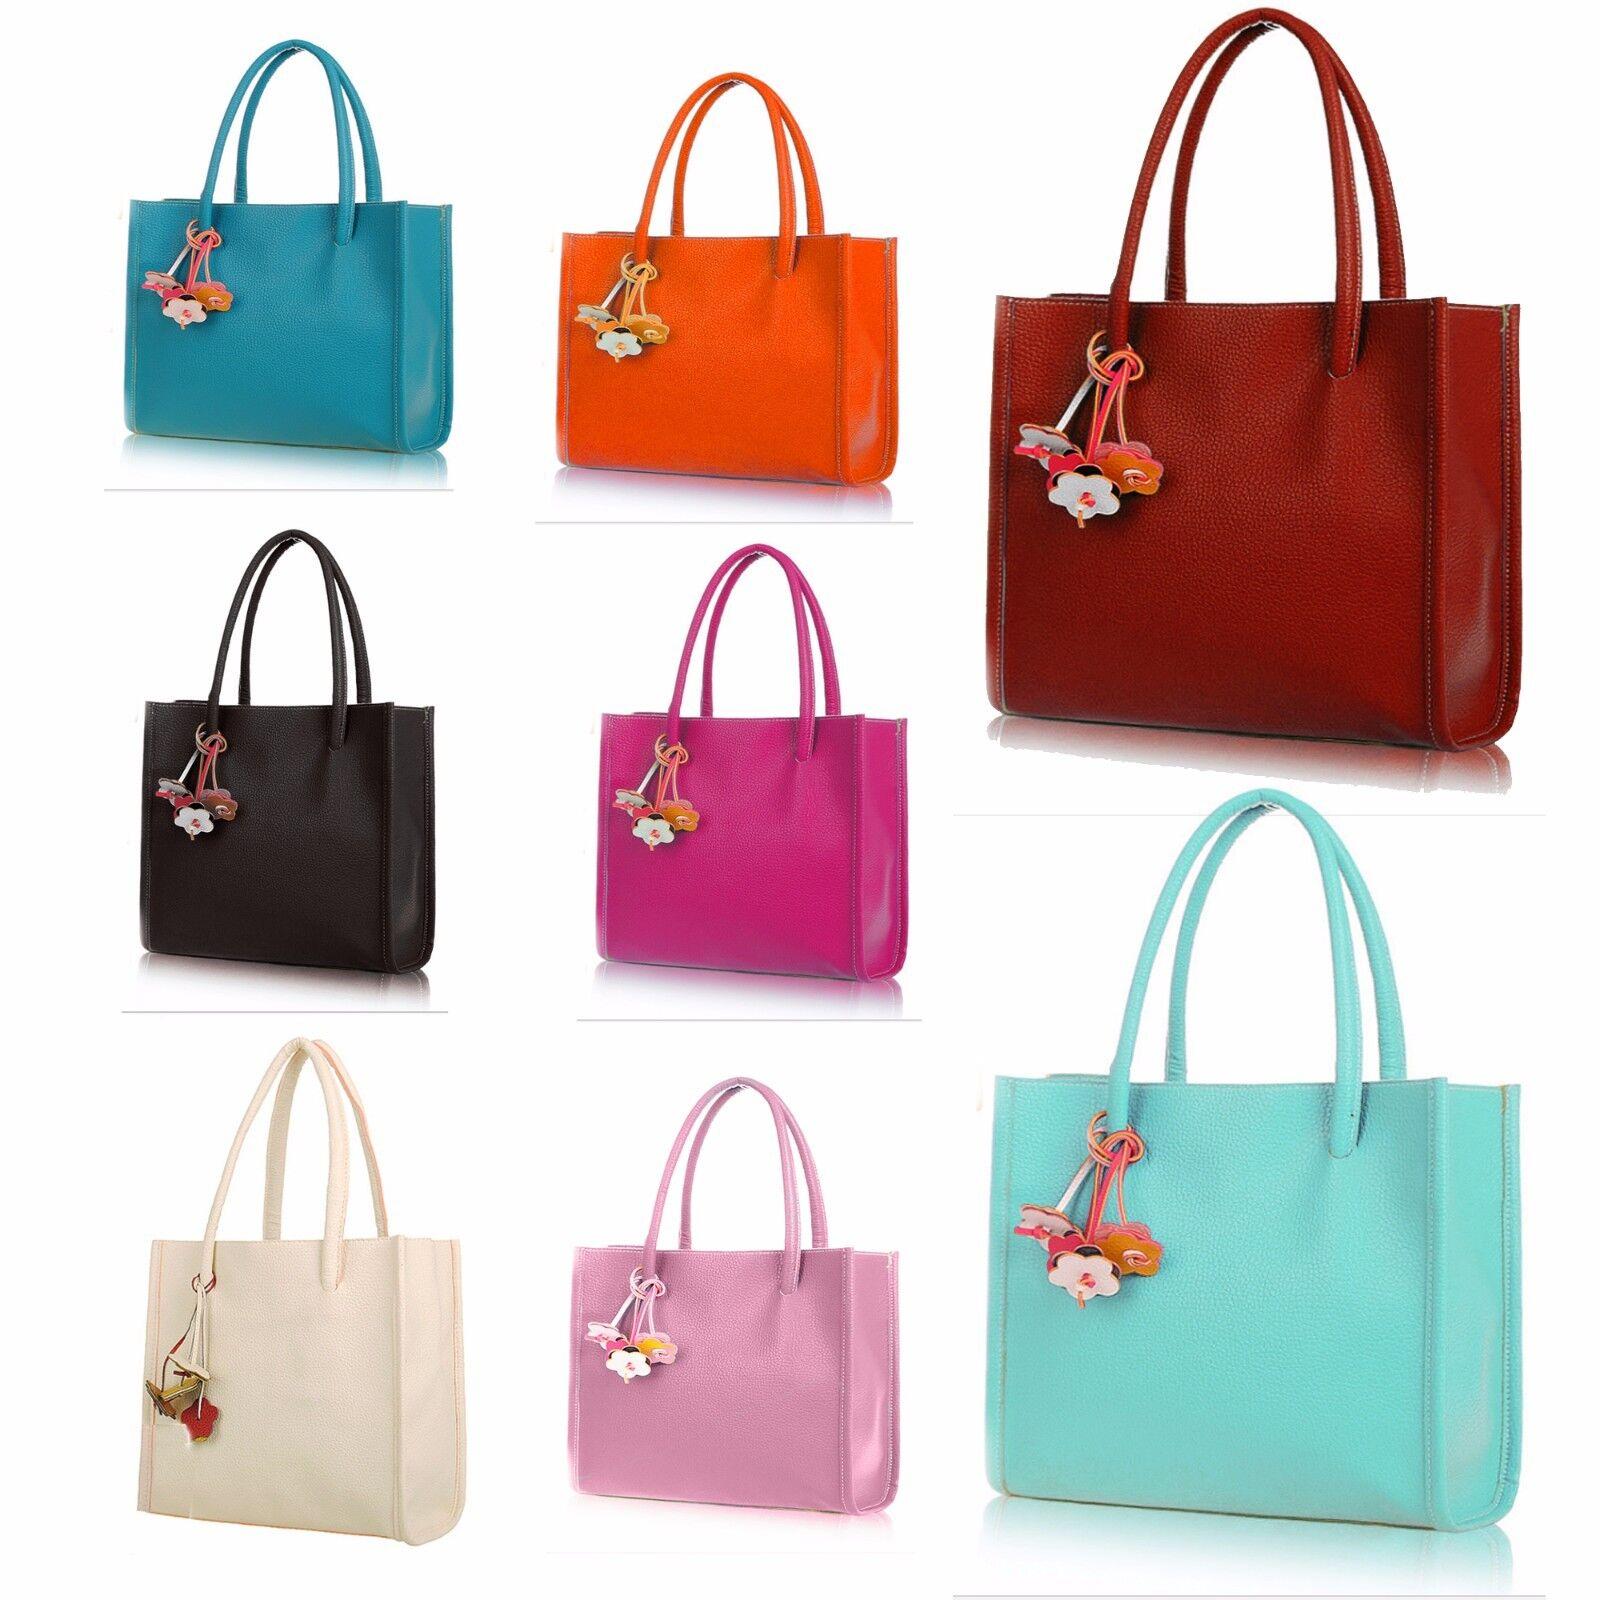 2fc157bd2c7e Details about Vincenza Designer Large Womens Faux Leather Shoulder Grab Bag  Style Summer Tote